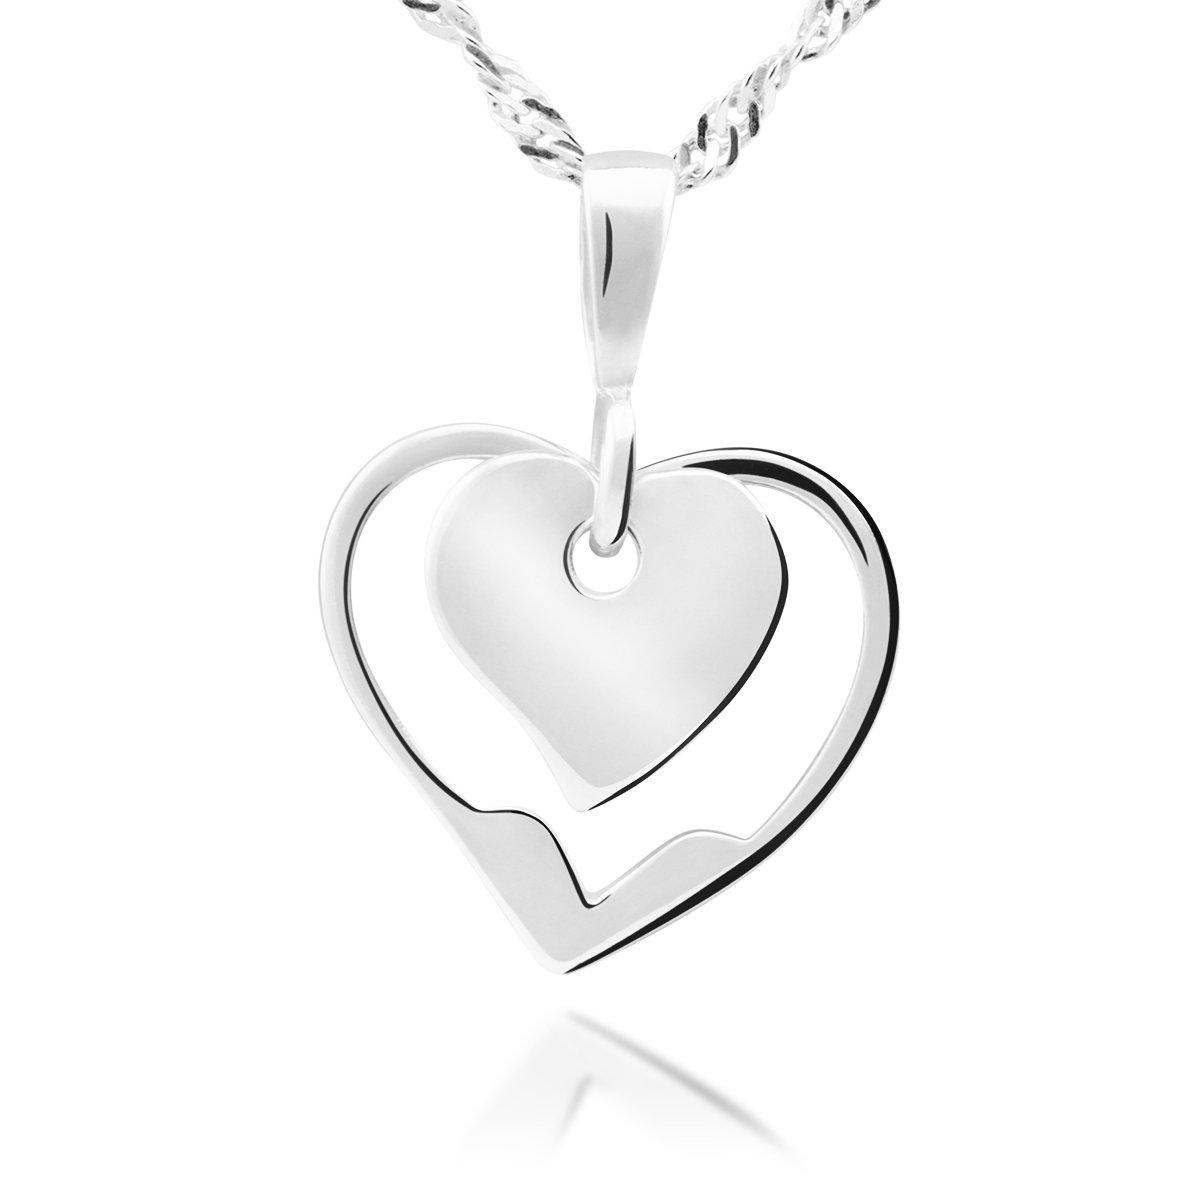 Serce w sercu Srebro 925 Walentynki Prezent z Grawerem